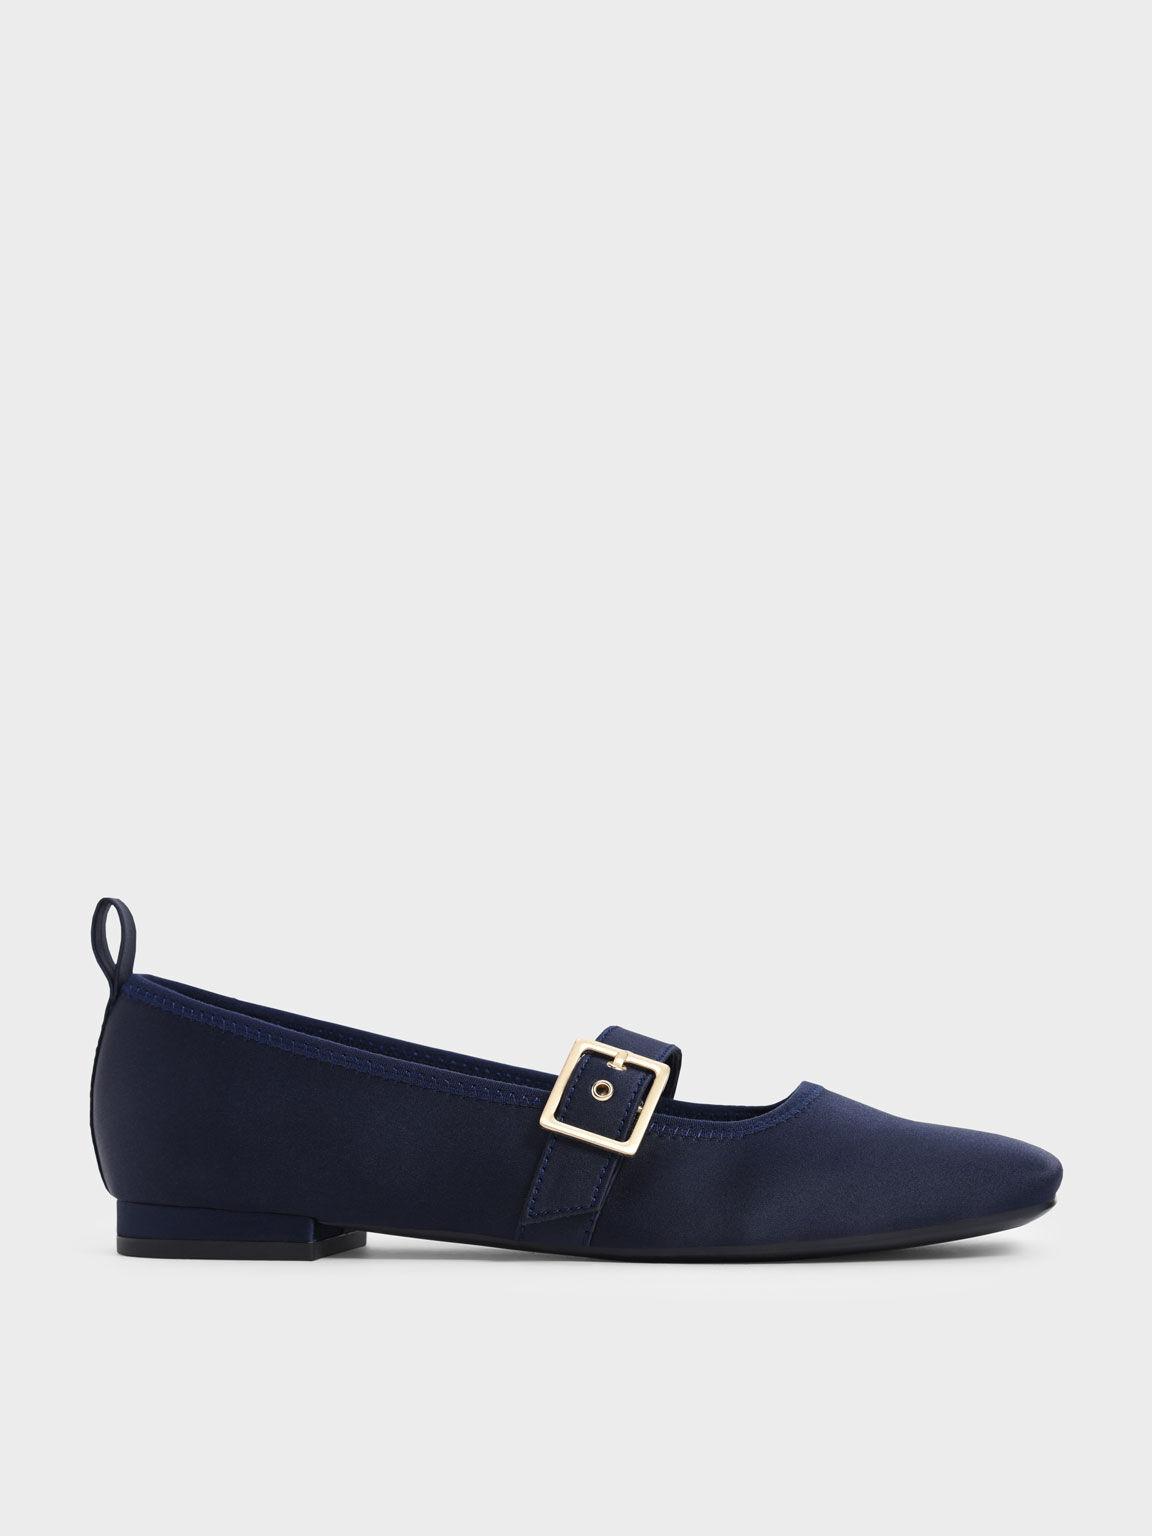 Satin Square Toe Mary Jane Flats, Dark Blue, hi-res